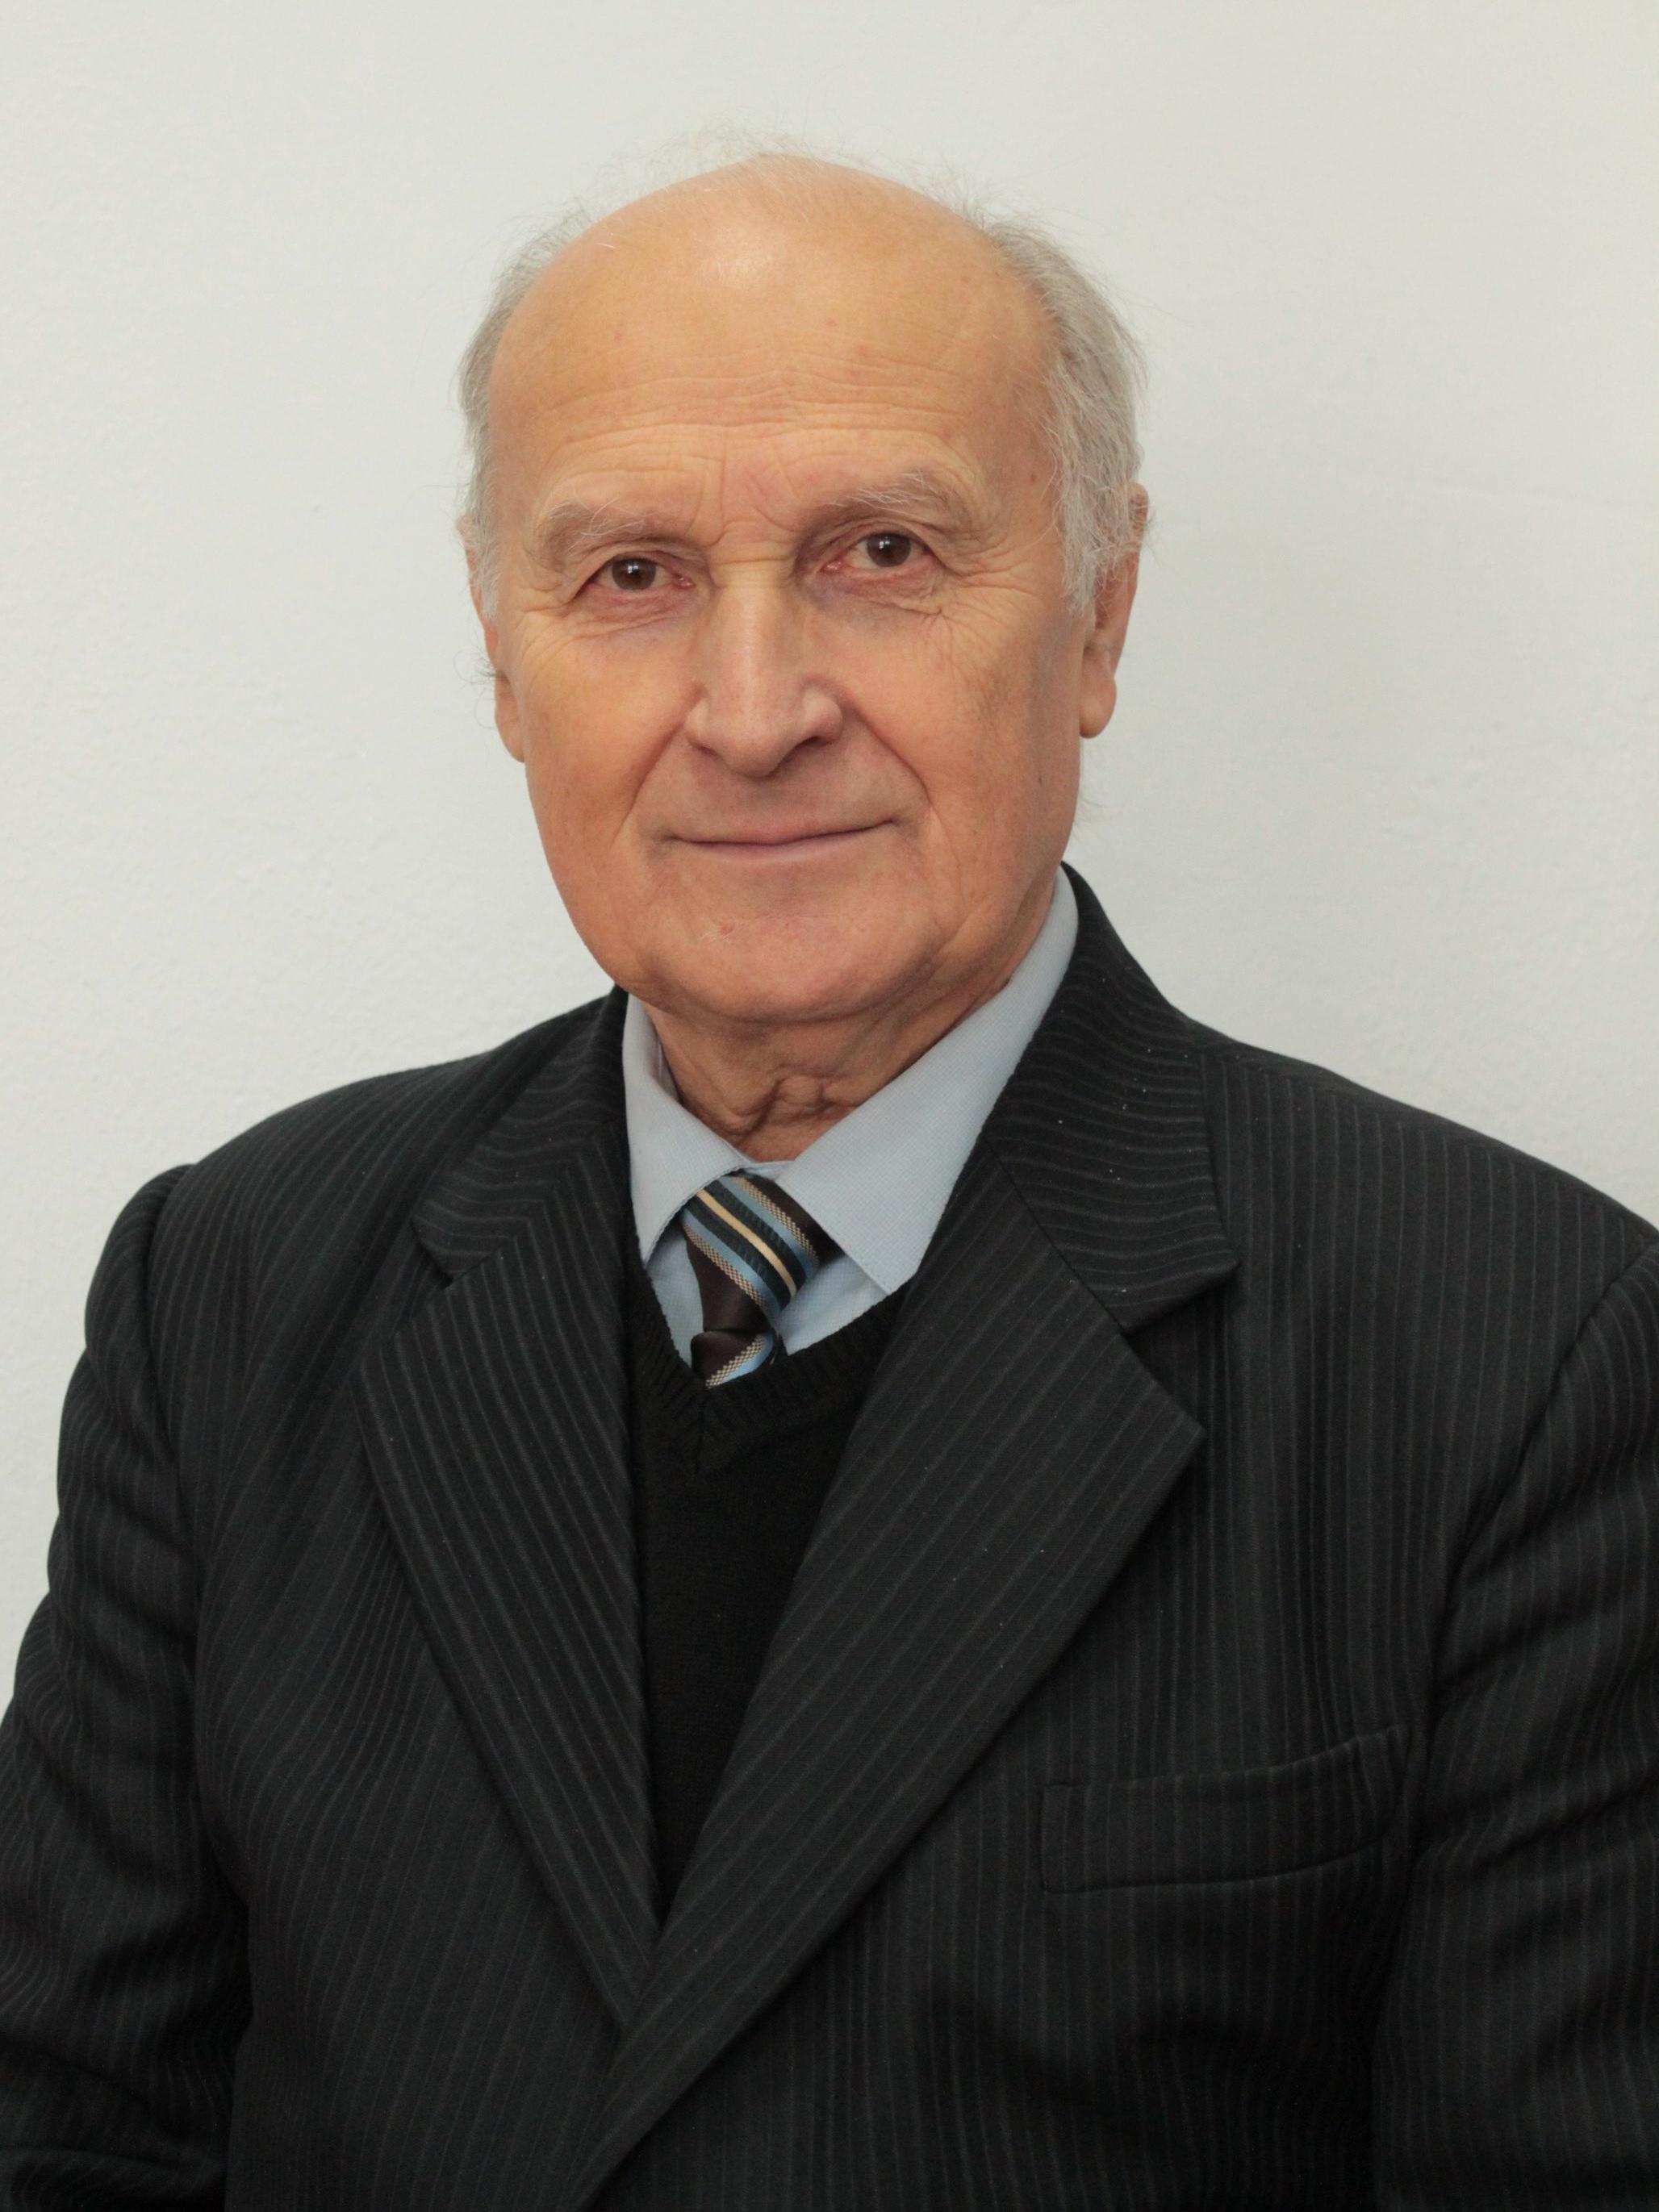 Склад кафедри АЕМС-ЕП на 2018 рік (з аспірантами) Печеник М.В.